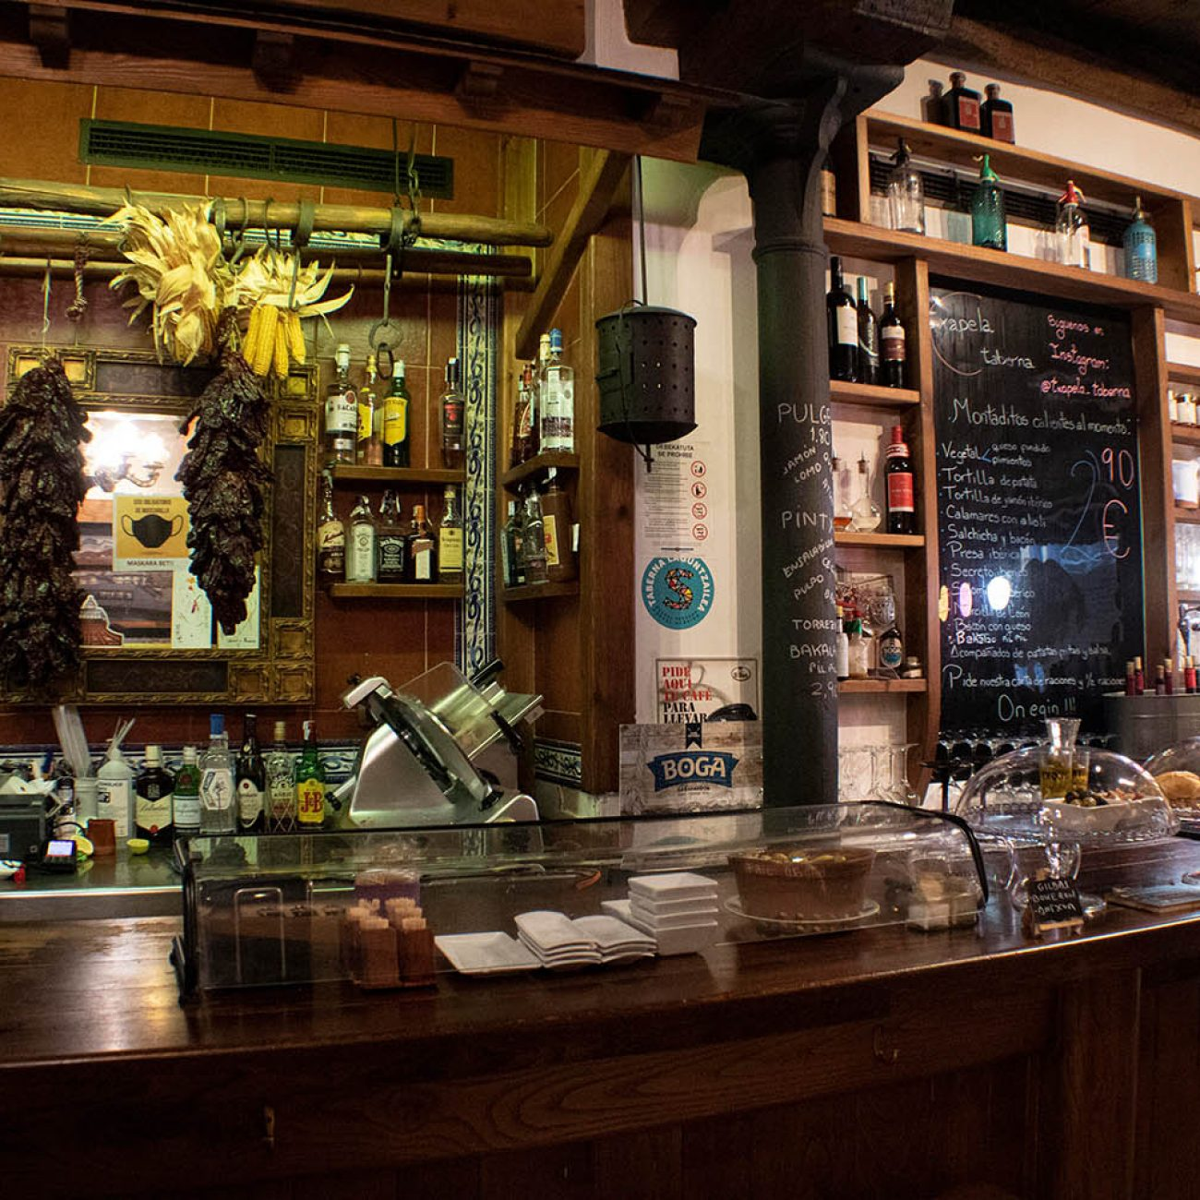 Txapela Taberna en el casco viejo de Bilbao